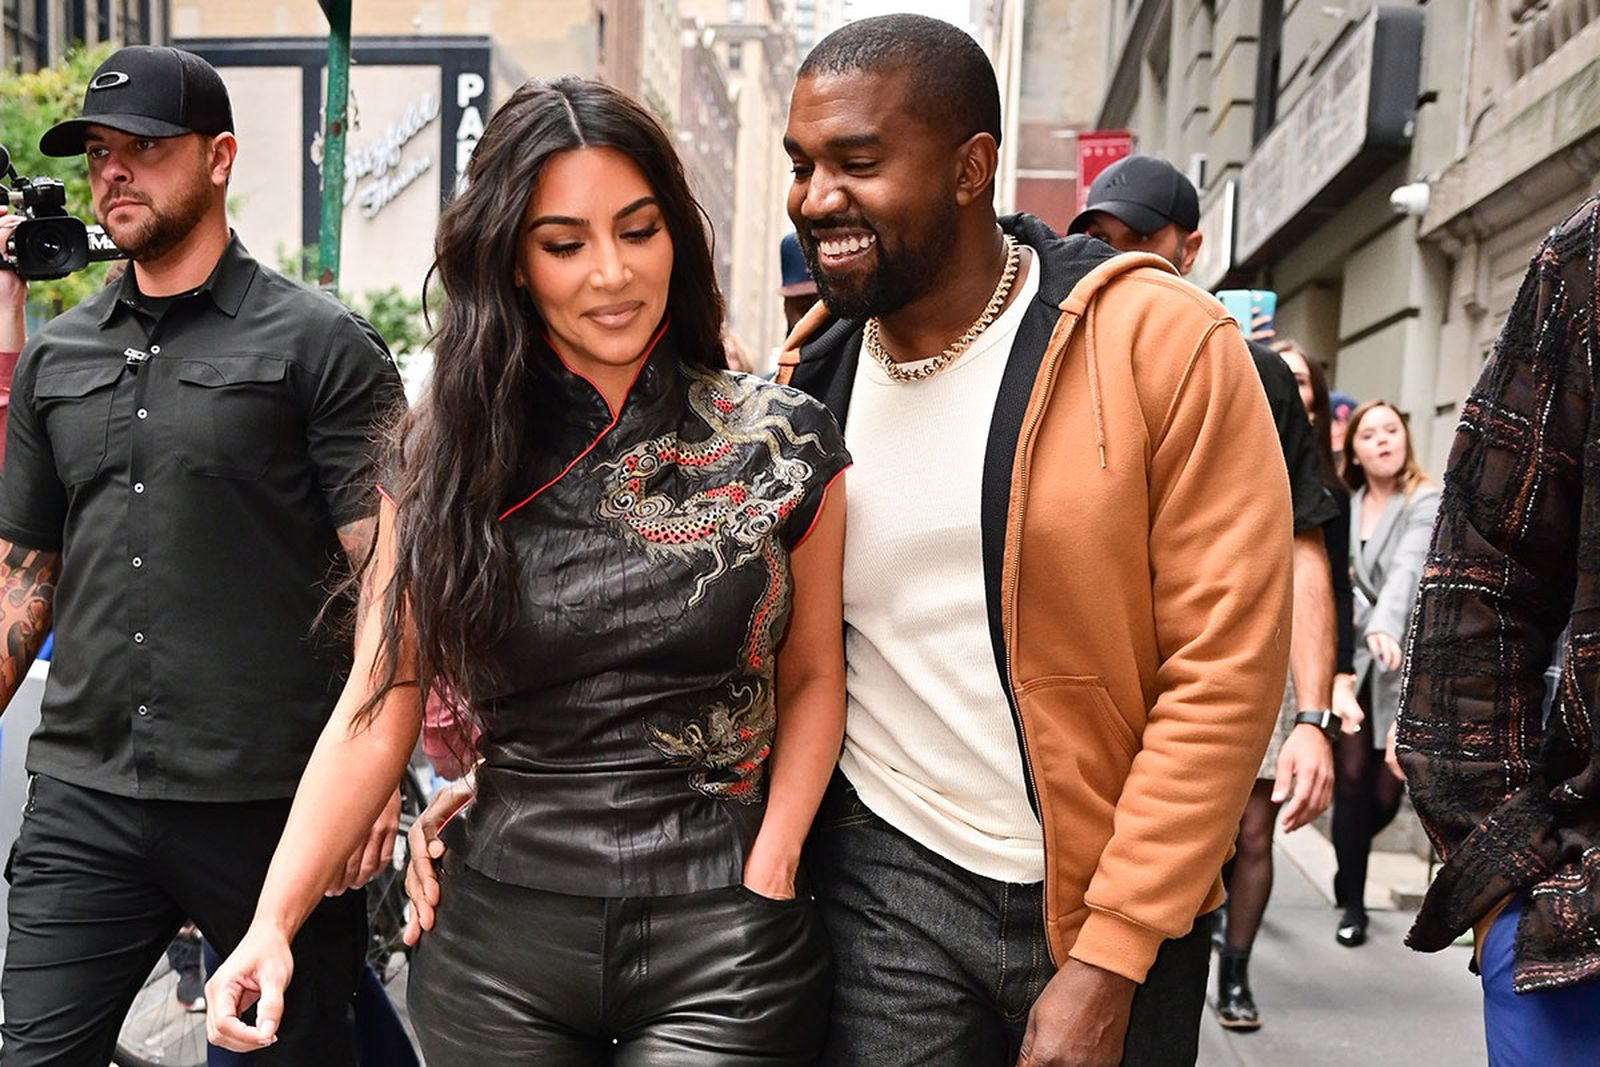 Kim Kardashian and Kanye West smiling walking together